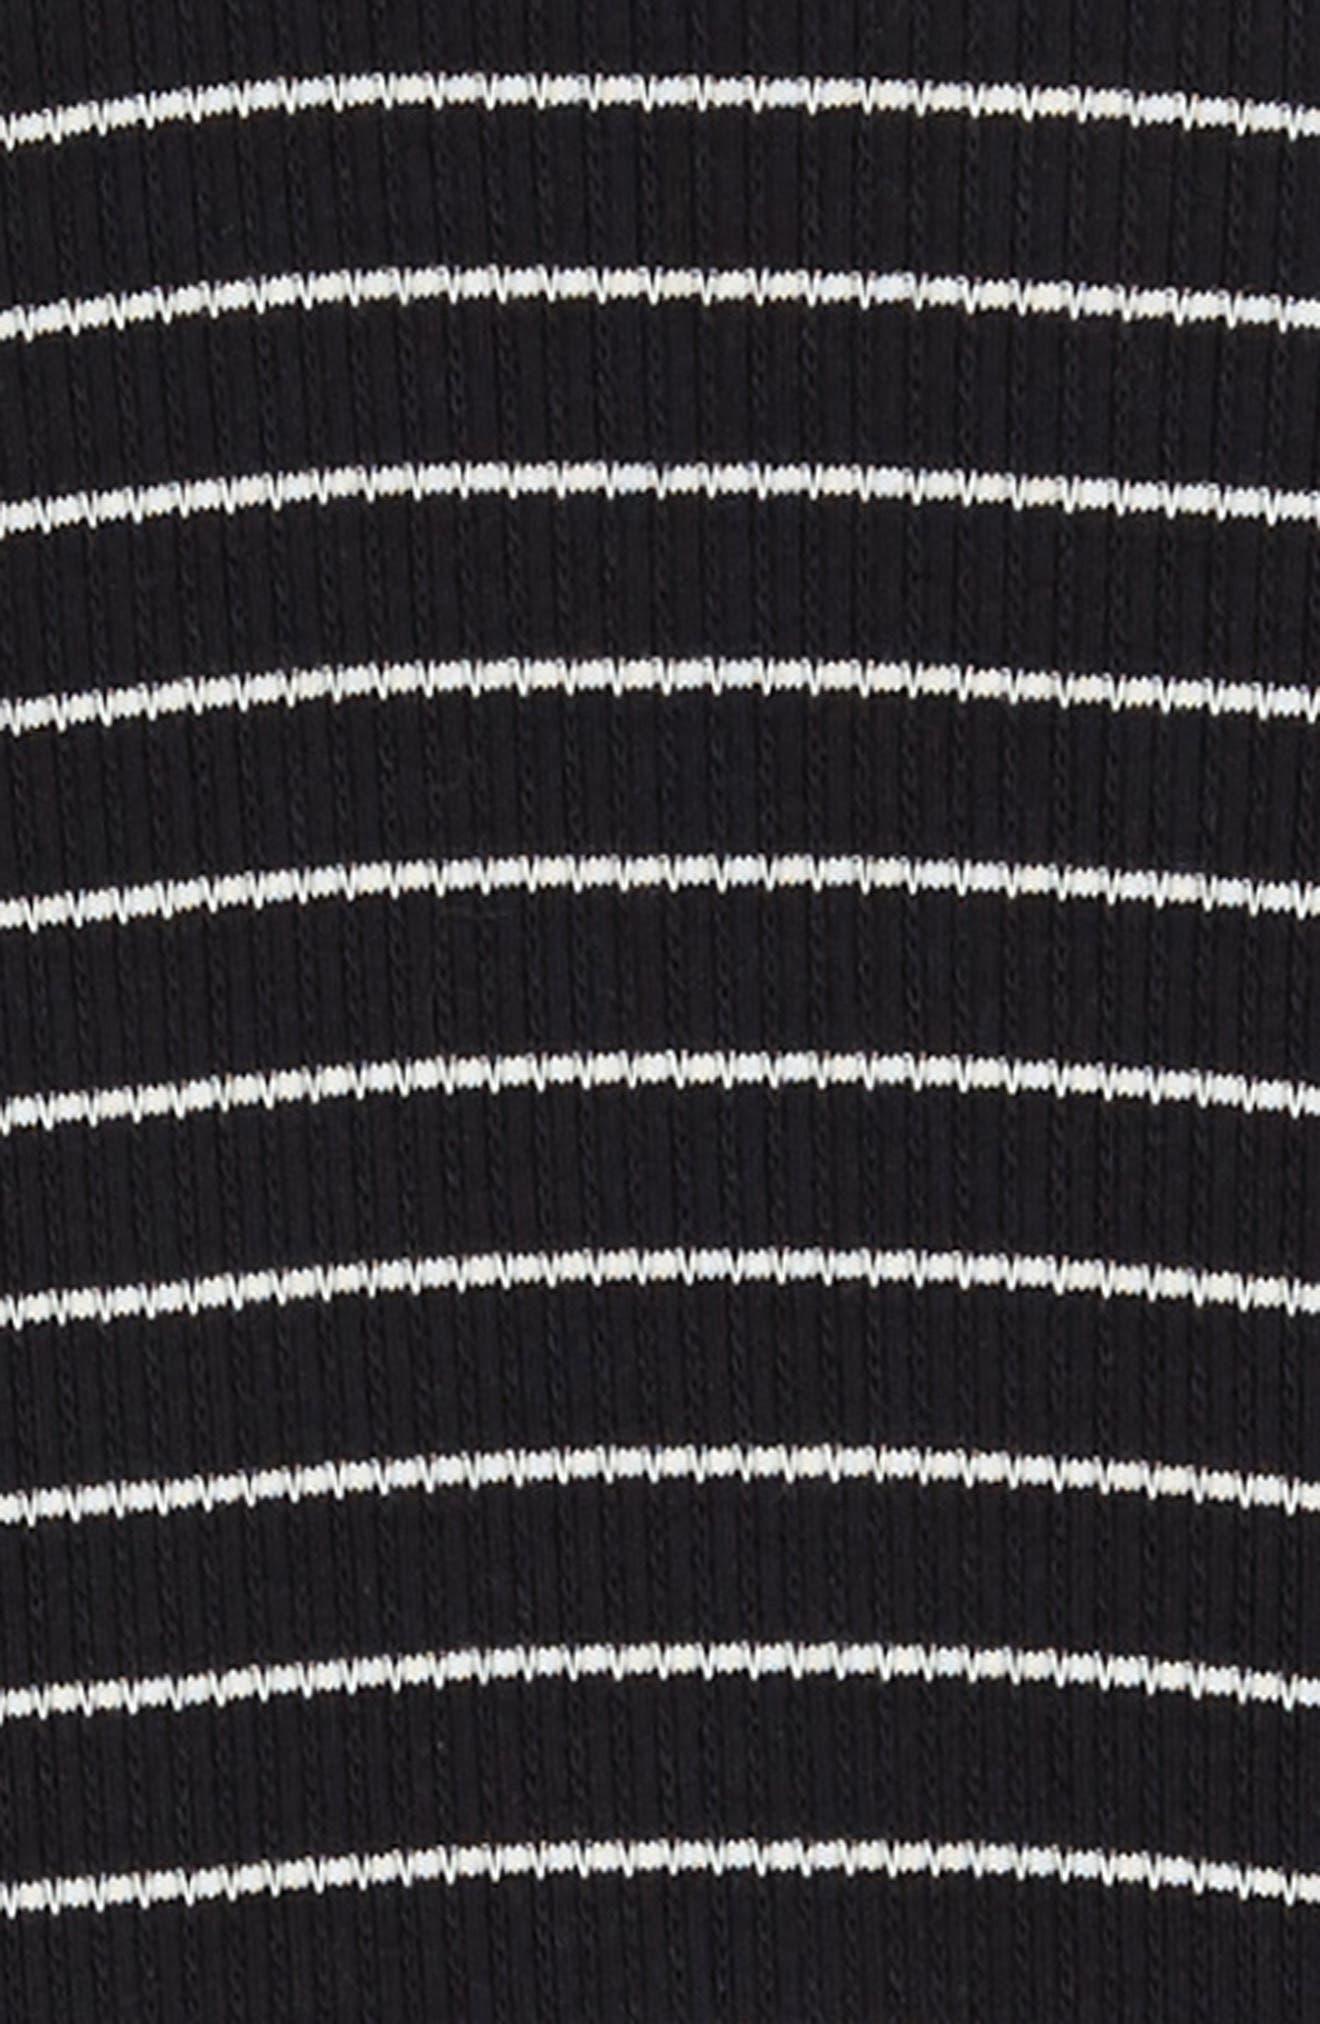 Millie Stripe Knit Dress,                             Alternate thumbnail 3, color,                             BLACK